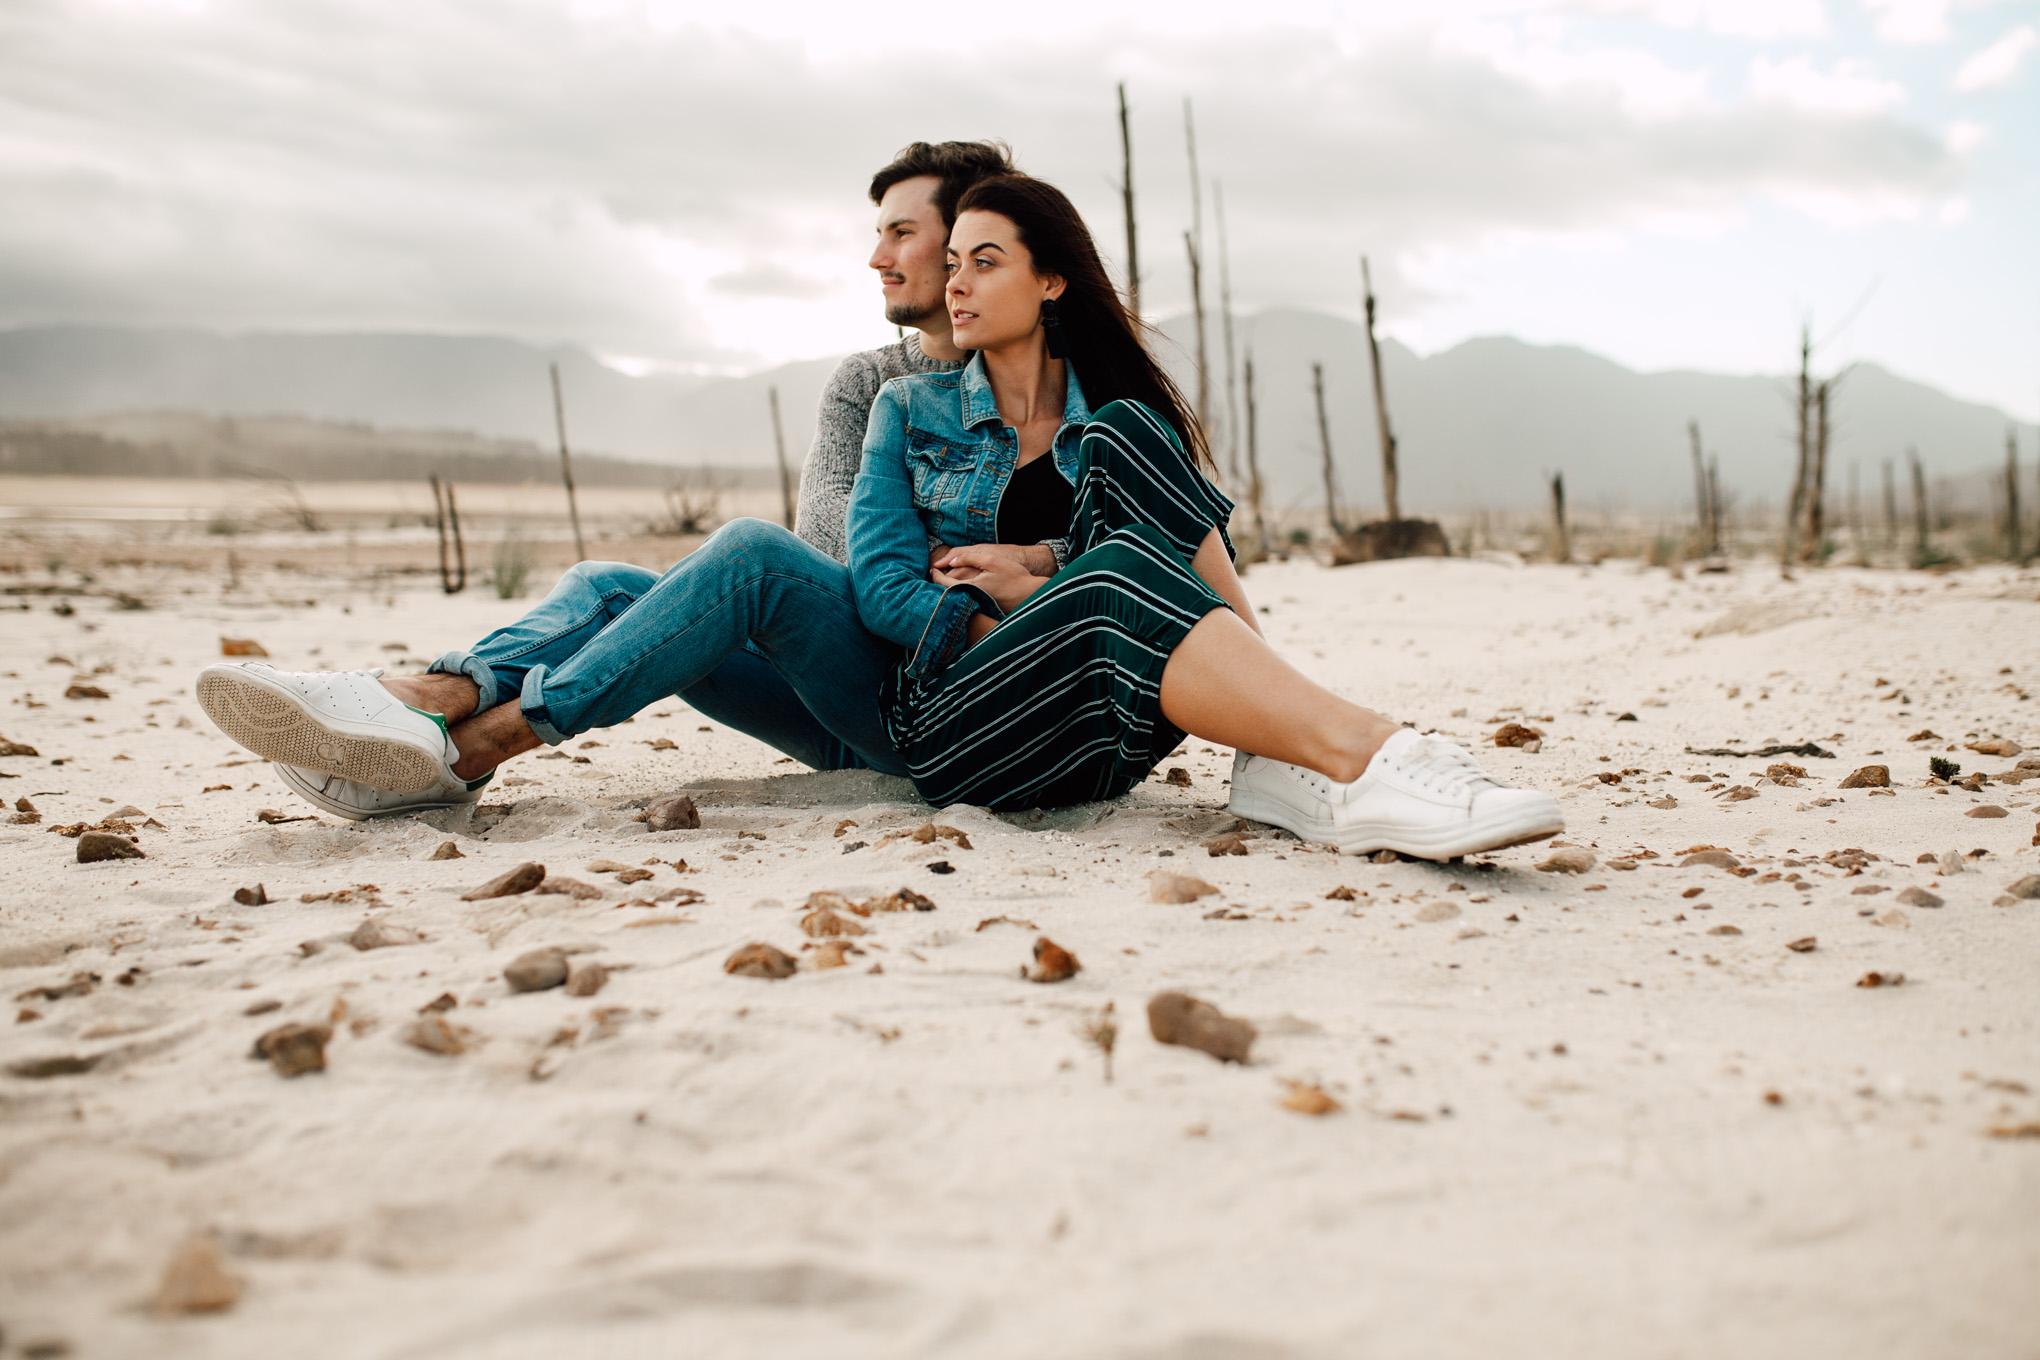 Cape-Town-Pia-Anna-Christian-Wedding-Photography-South-Africa-KF-64.jpg